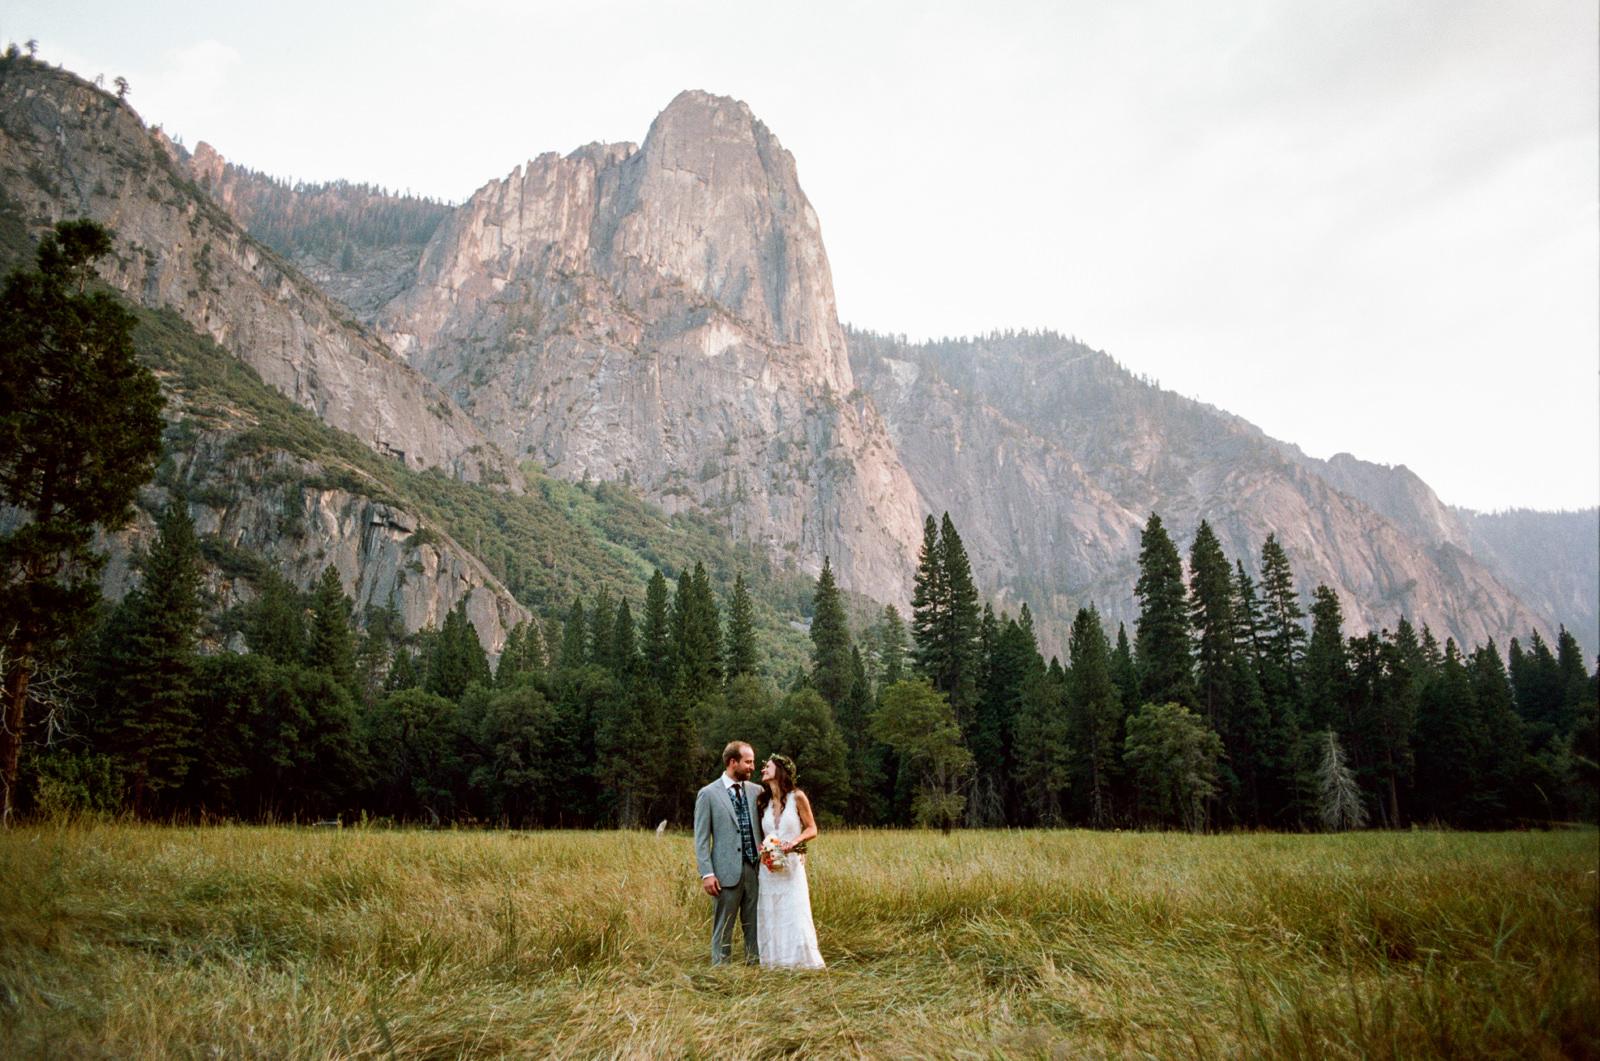 yosemite-intimate-wedding-090 YOSEMITE INTIMATE WEDDING